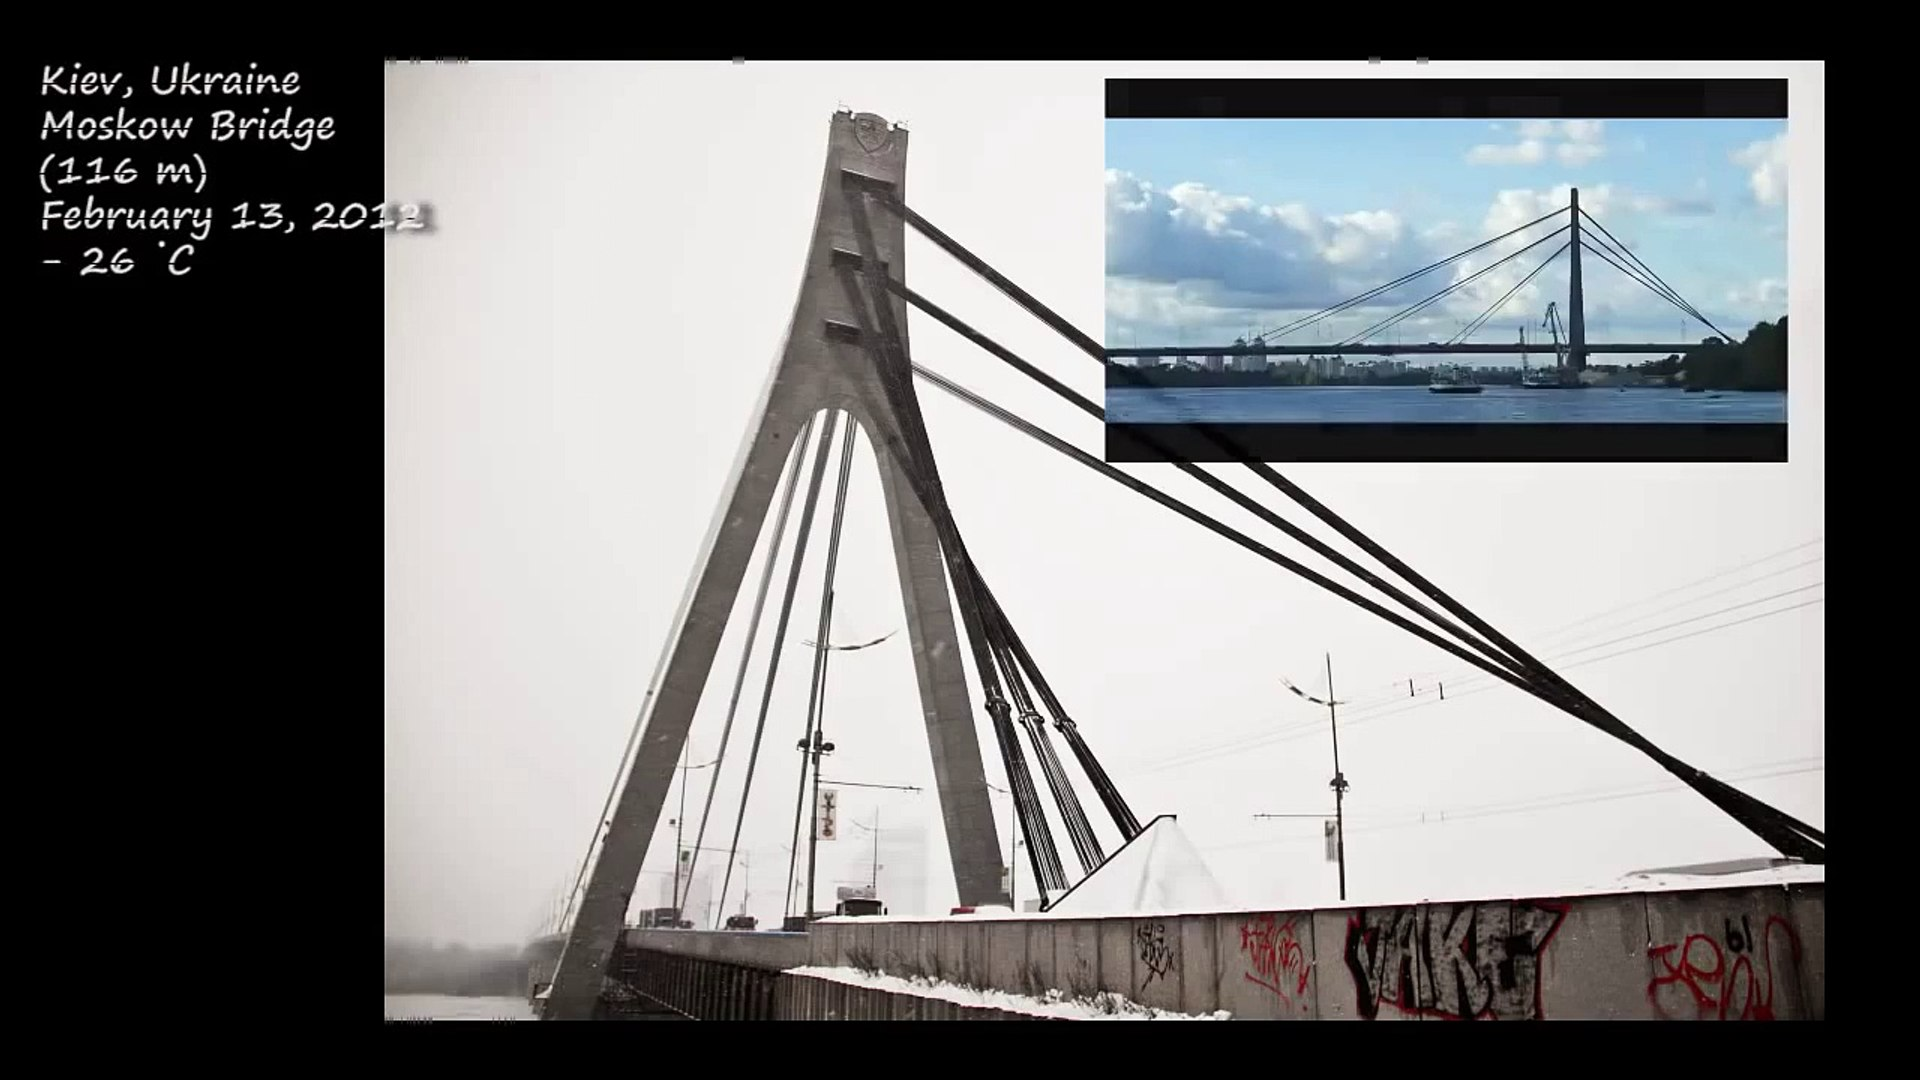 Moskovskiy Bridge Winter 2012 - Московский мост Зима 2012